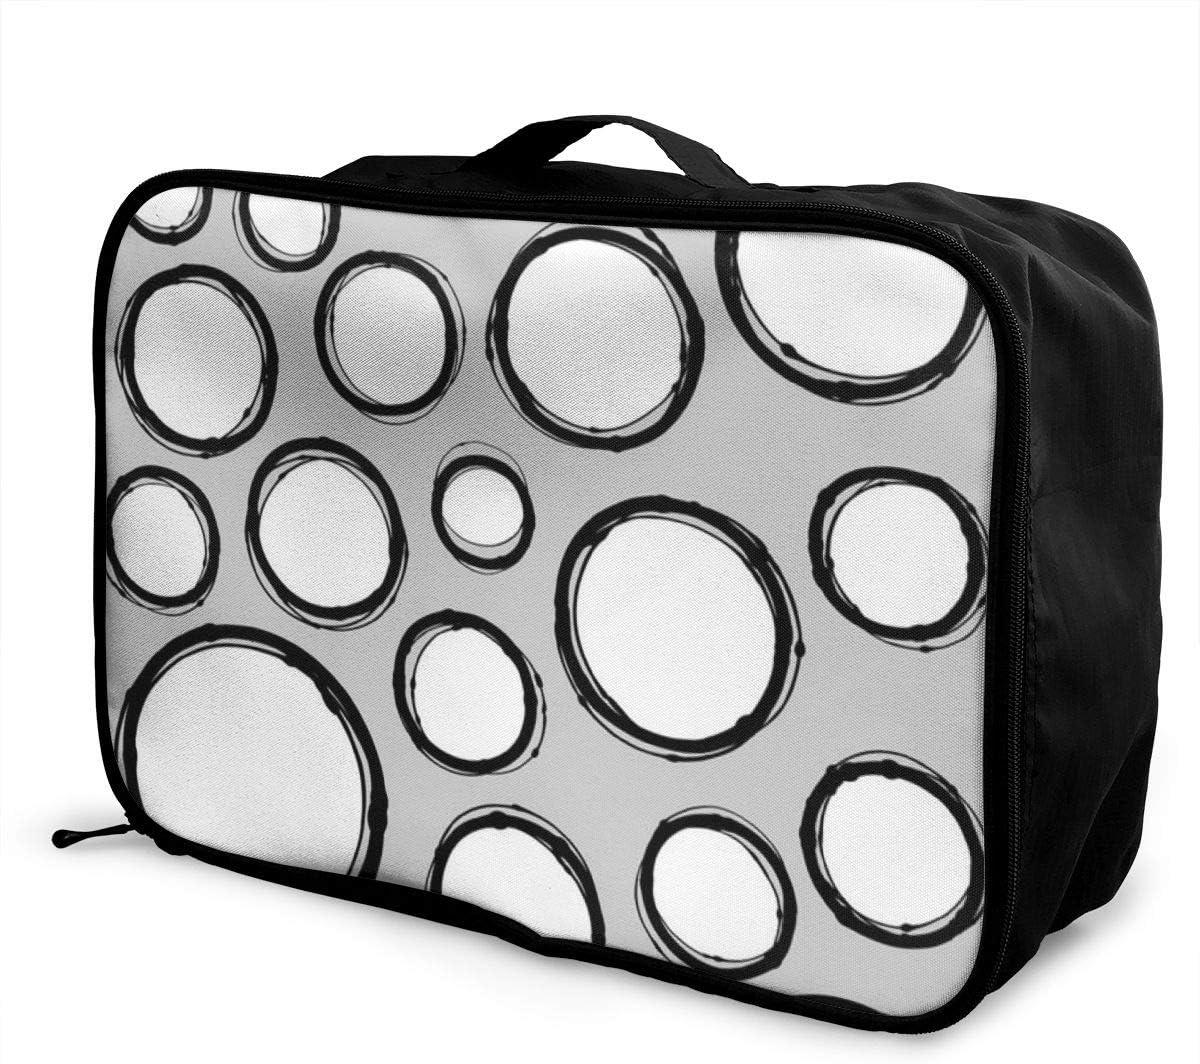 Yunshm Hand Drawn Line Circle Shape Pattern Customized Trolley Handbag Waterproof Unisex Large Capacity For Business Travel Storage